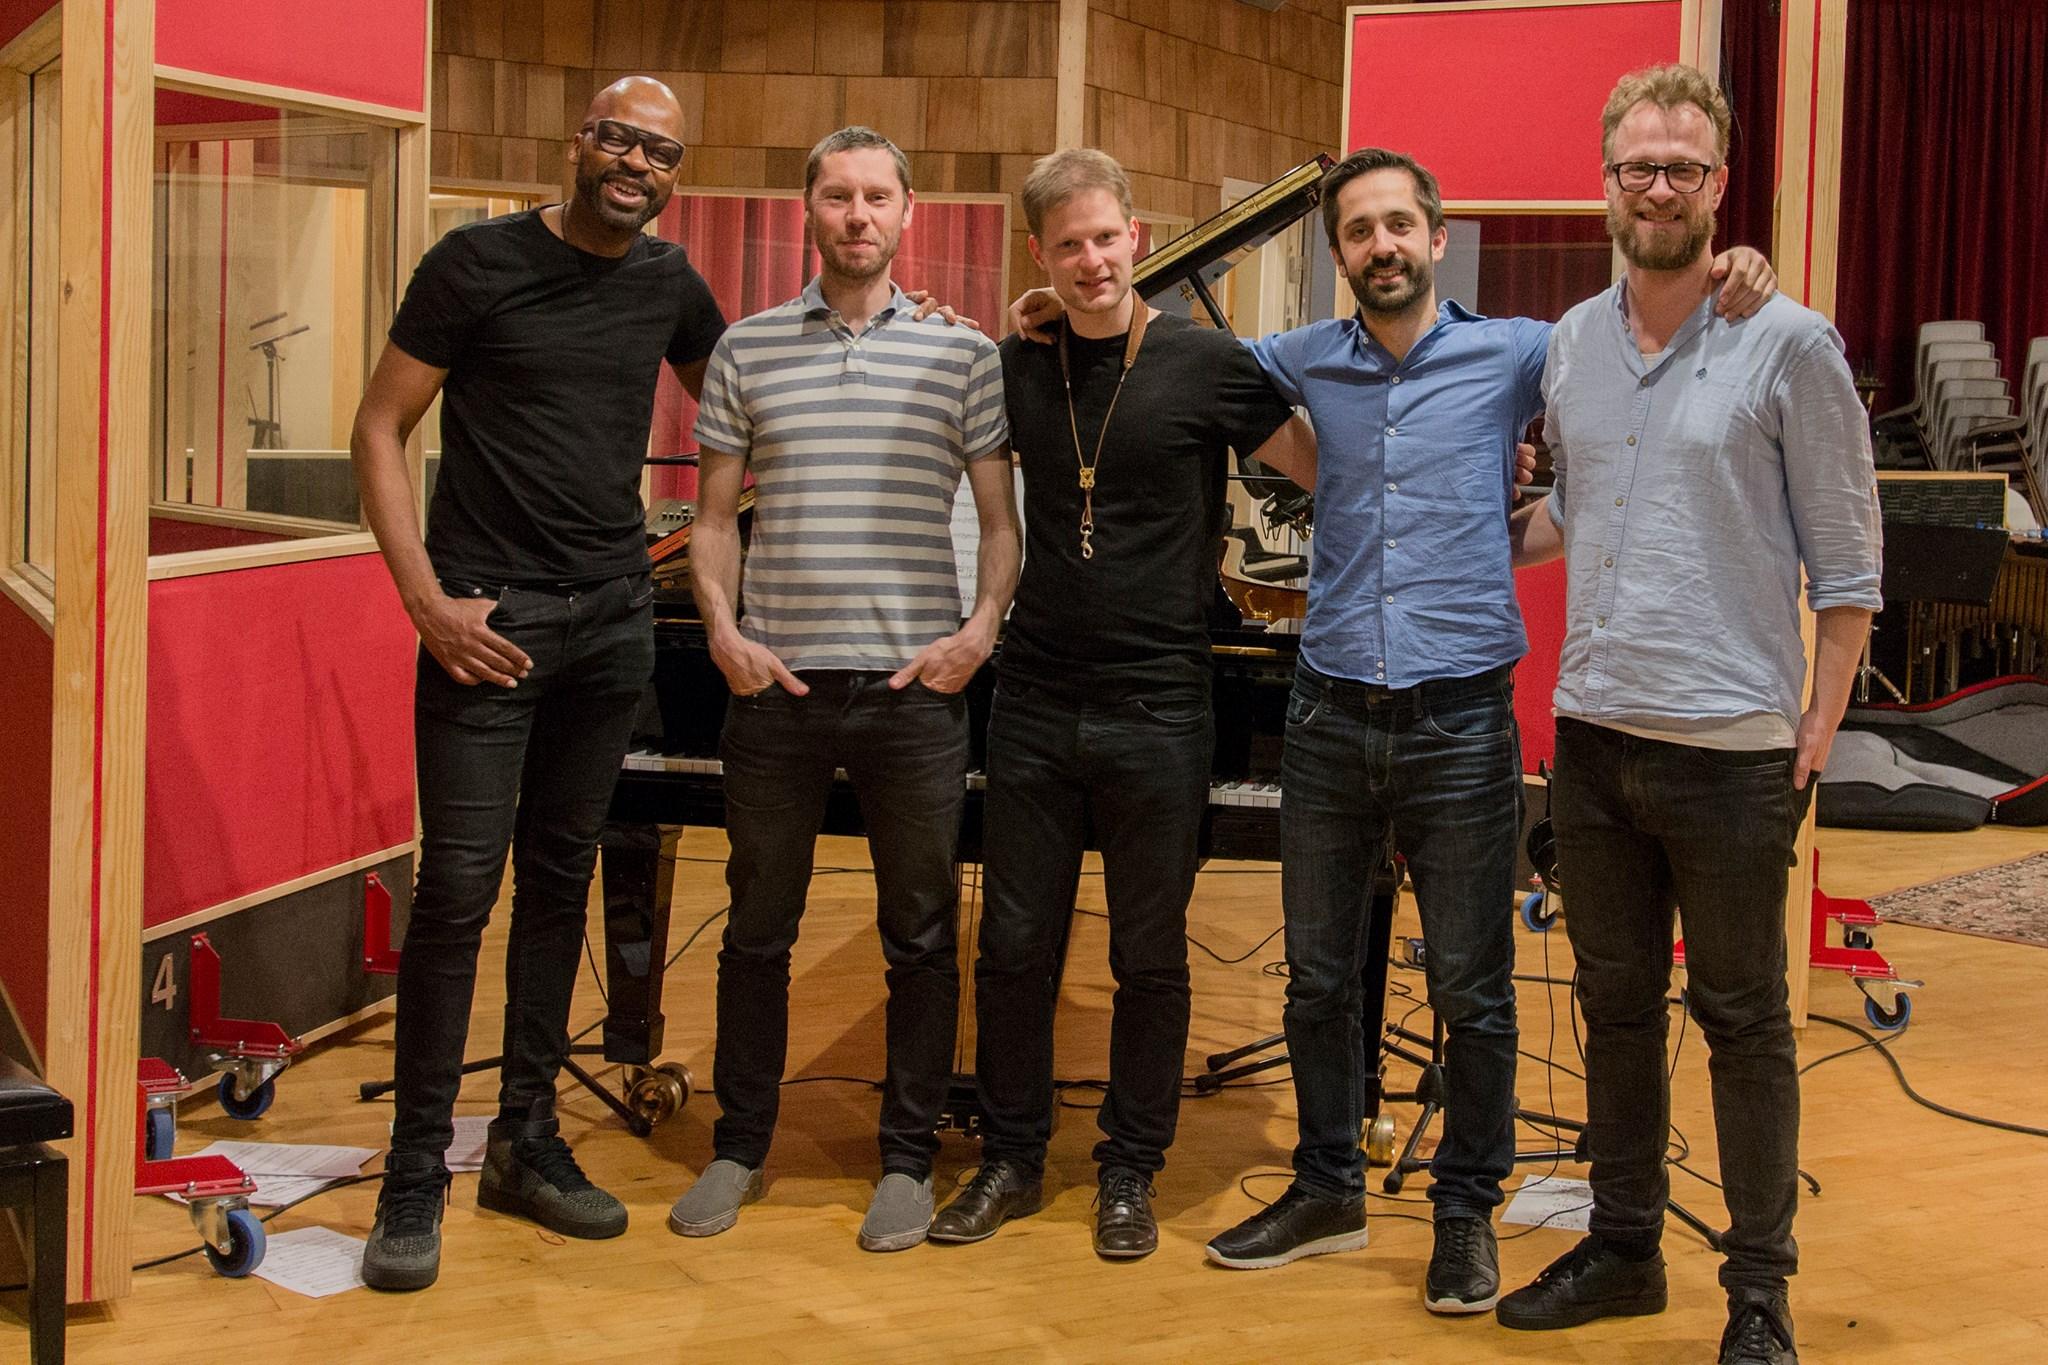 Lubos Soukup Quartet feat Lionel Loueke at the Village recording Studio in Copenhagen Denmark